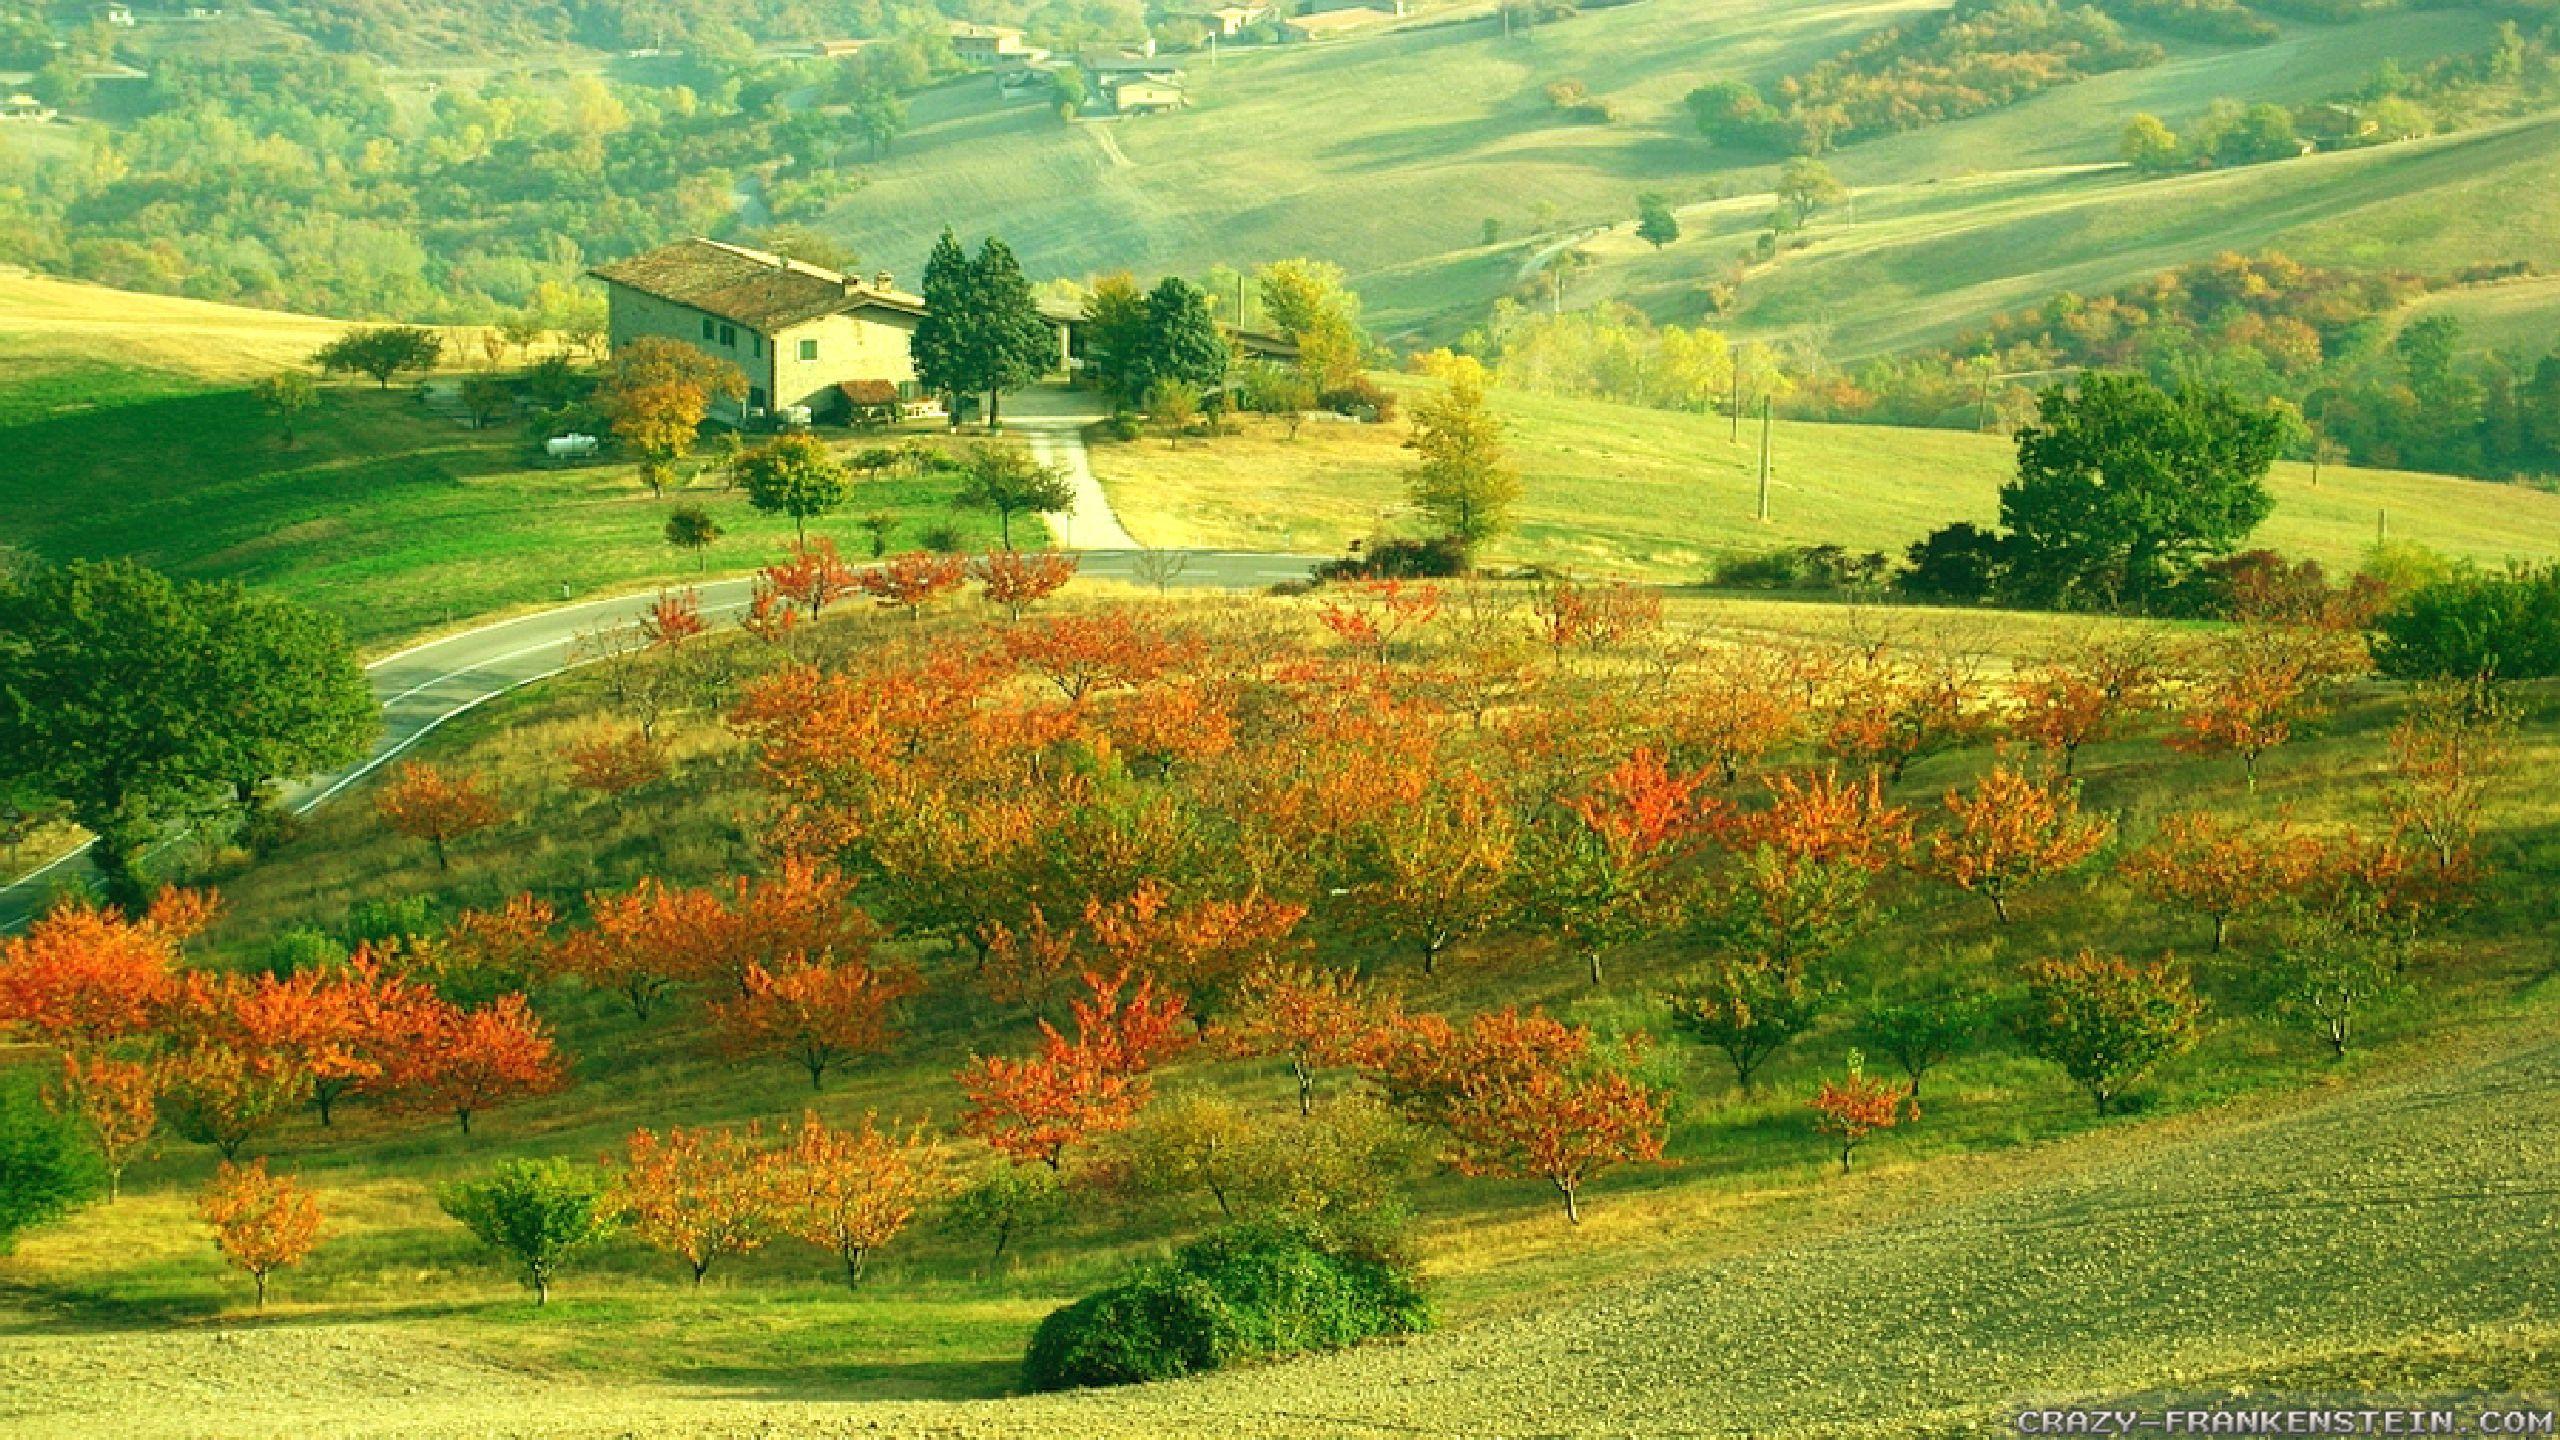 Free Download Pin Wonderful Scene Autumn In Italy Wallpapers 2560x1440jpg On 2560x1440 For Your Desktop Mobile Tablet Explore 44 Wallpaper Italian Scenes Italian Wallpaper Italy Wallpaper Italian Wallpapers For Desktop